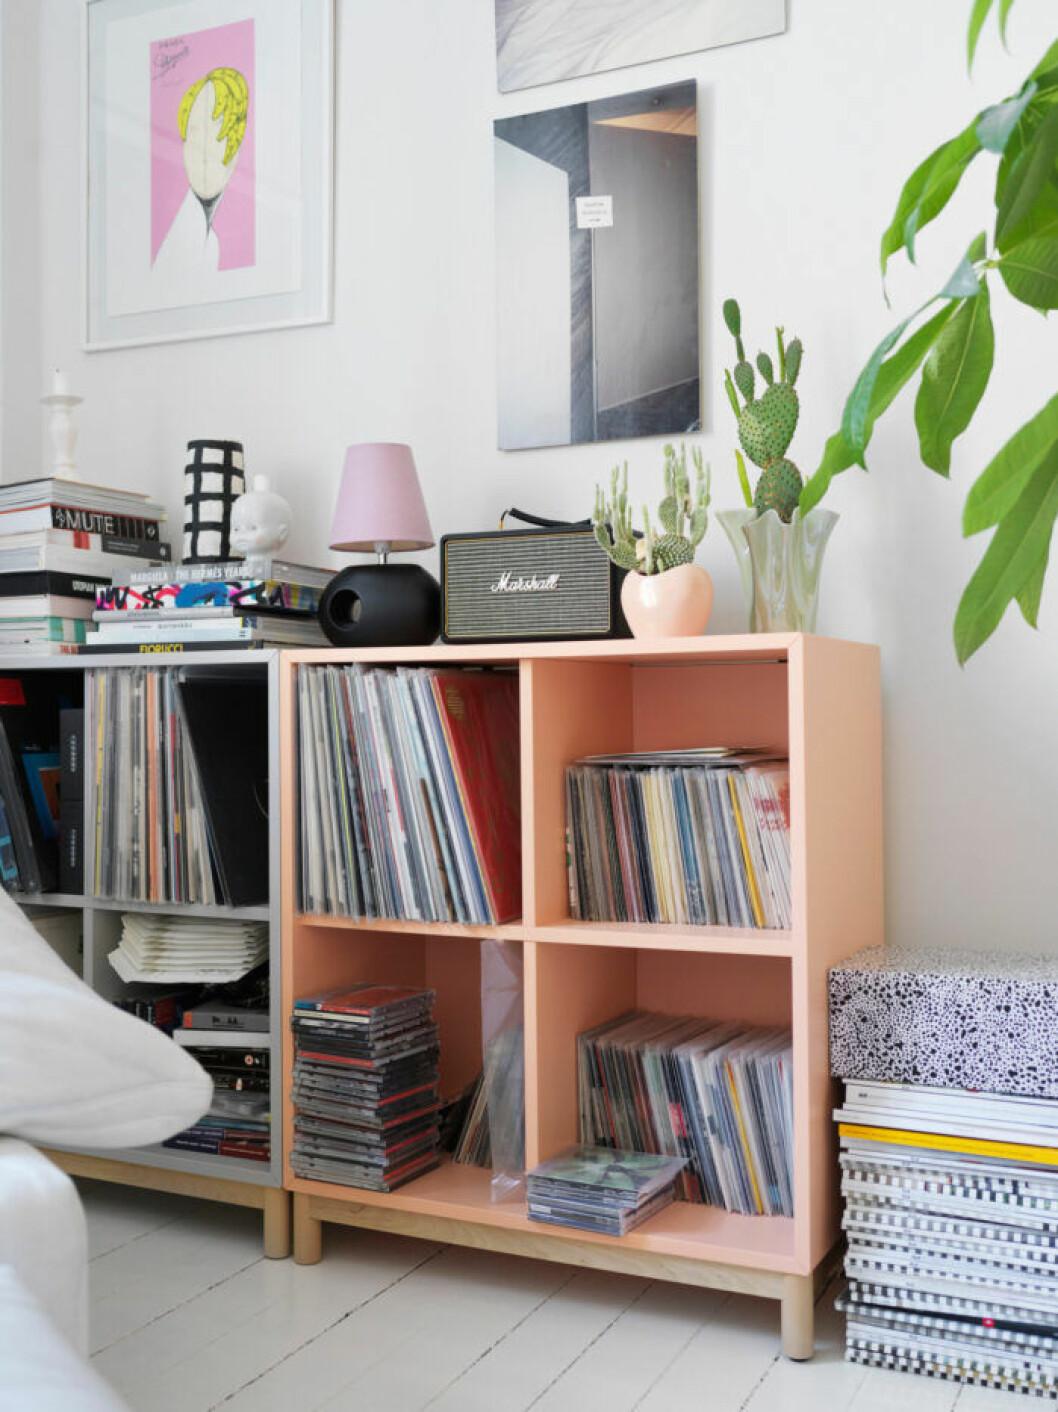 Hylla med vinylskivor hos modedesignern på Södermalm i Stockholm